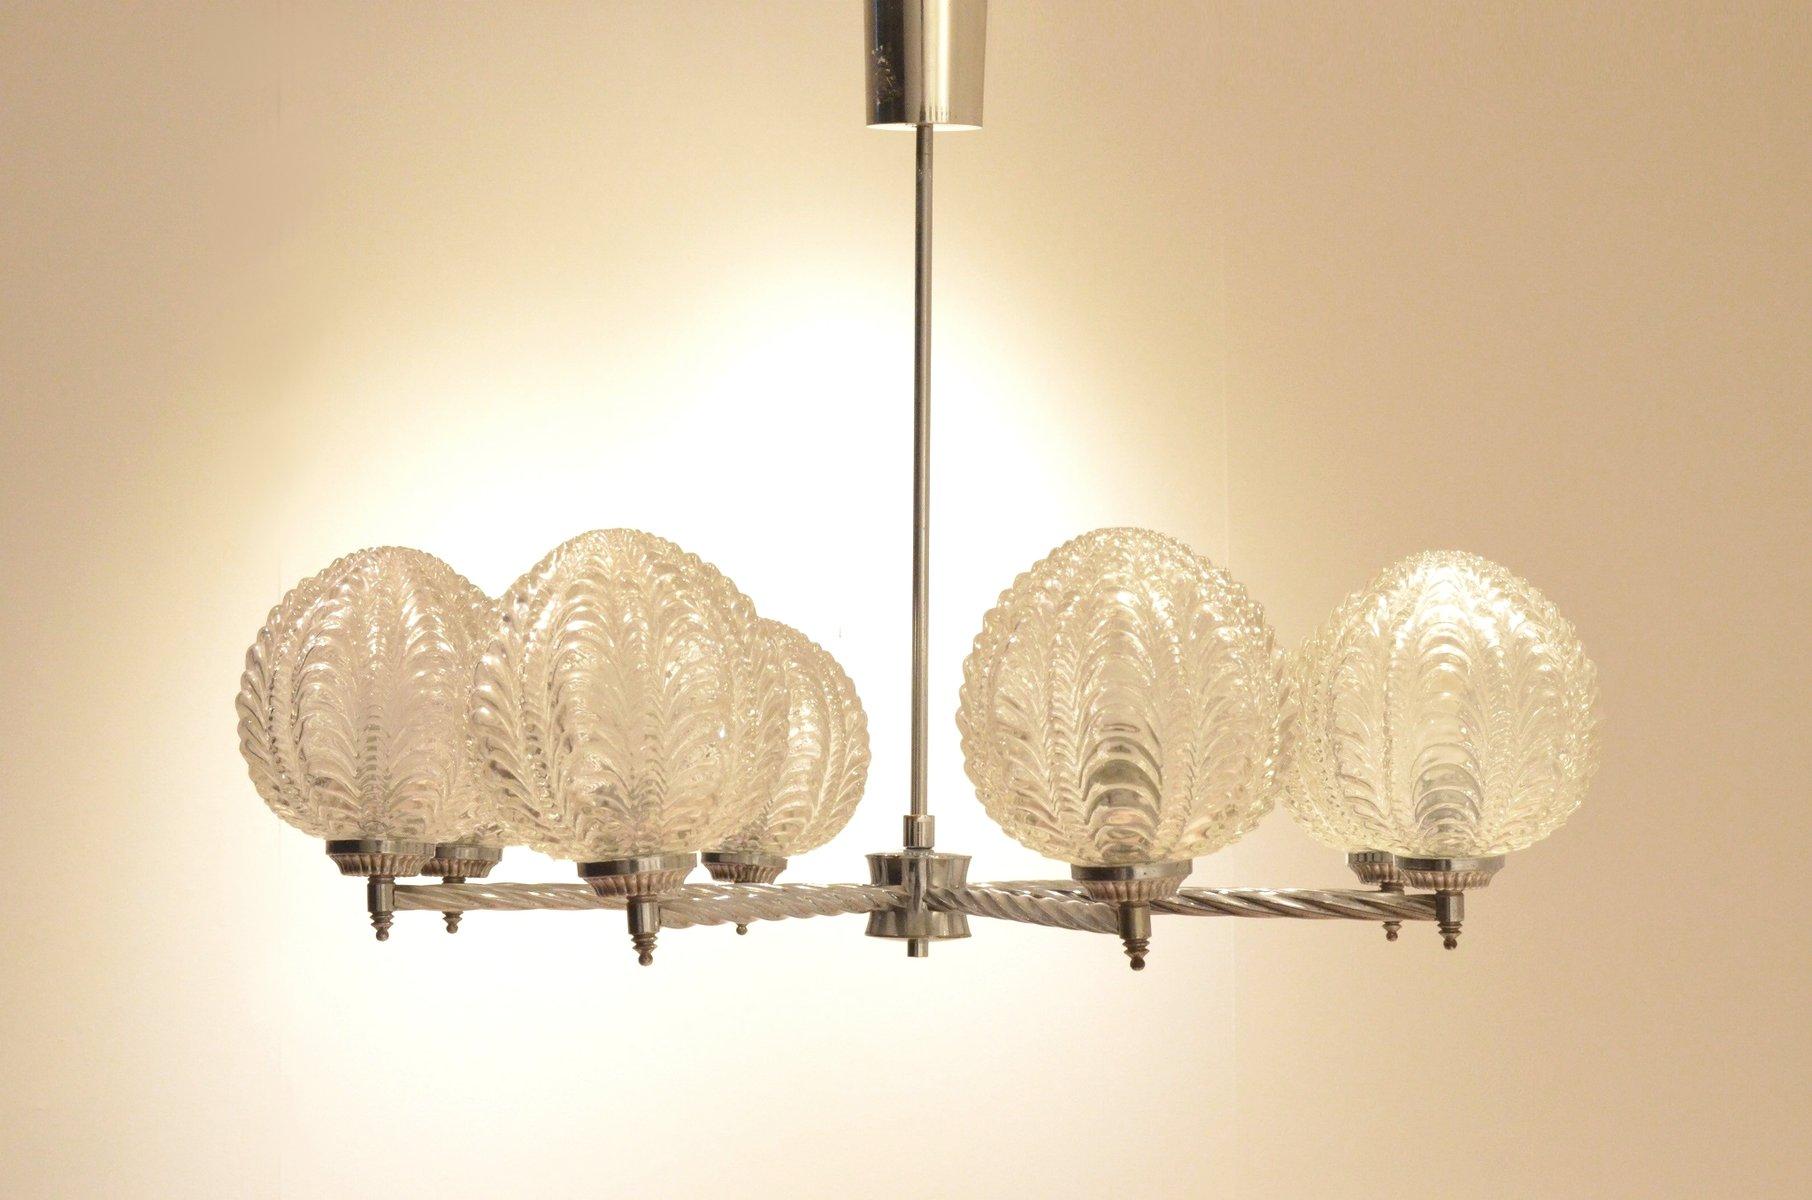 lustre art d co en m tal nickel et en verre avec motif. Black Bedroom Furniture Sets. Home Design Ideas